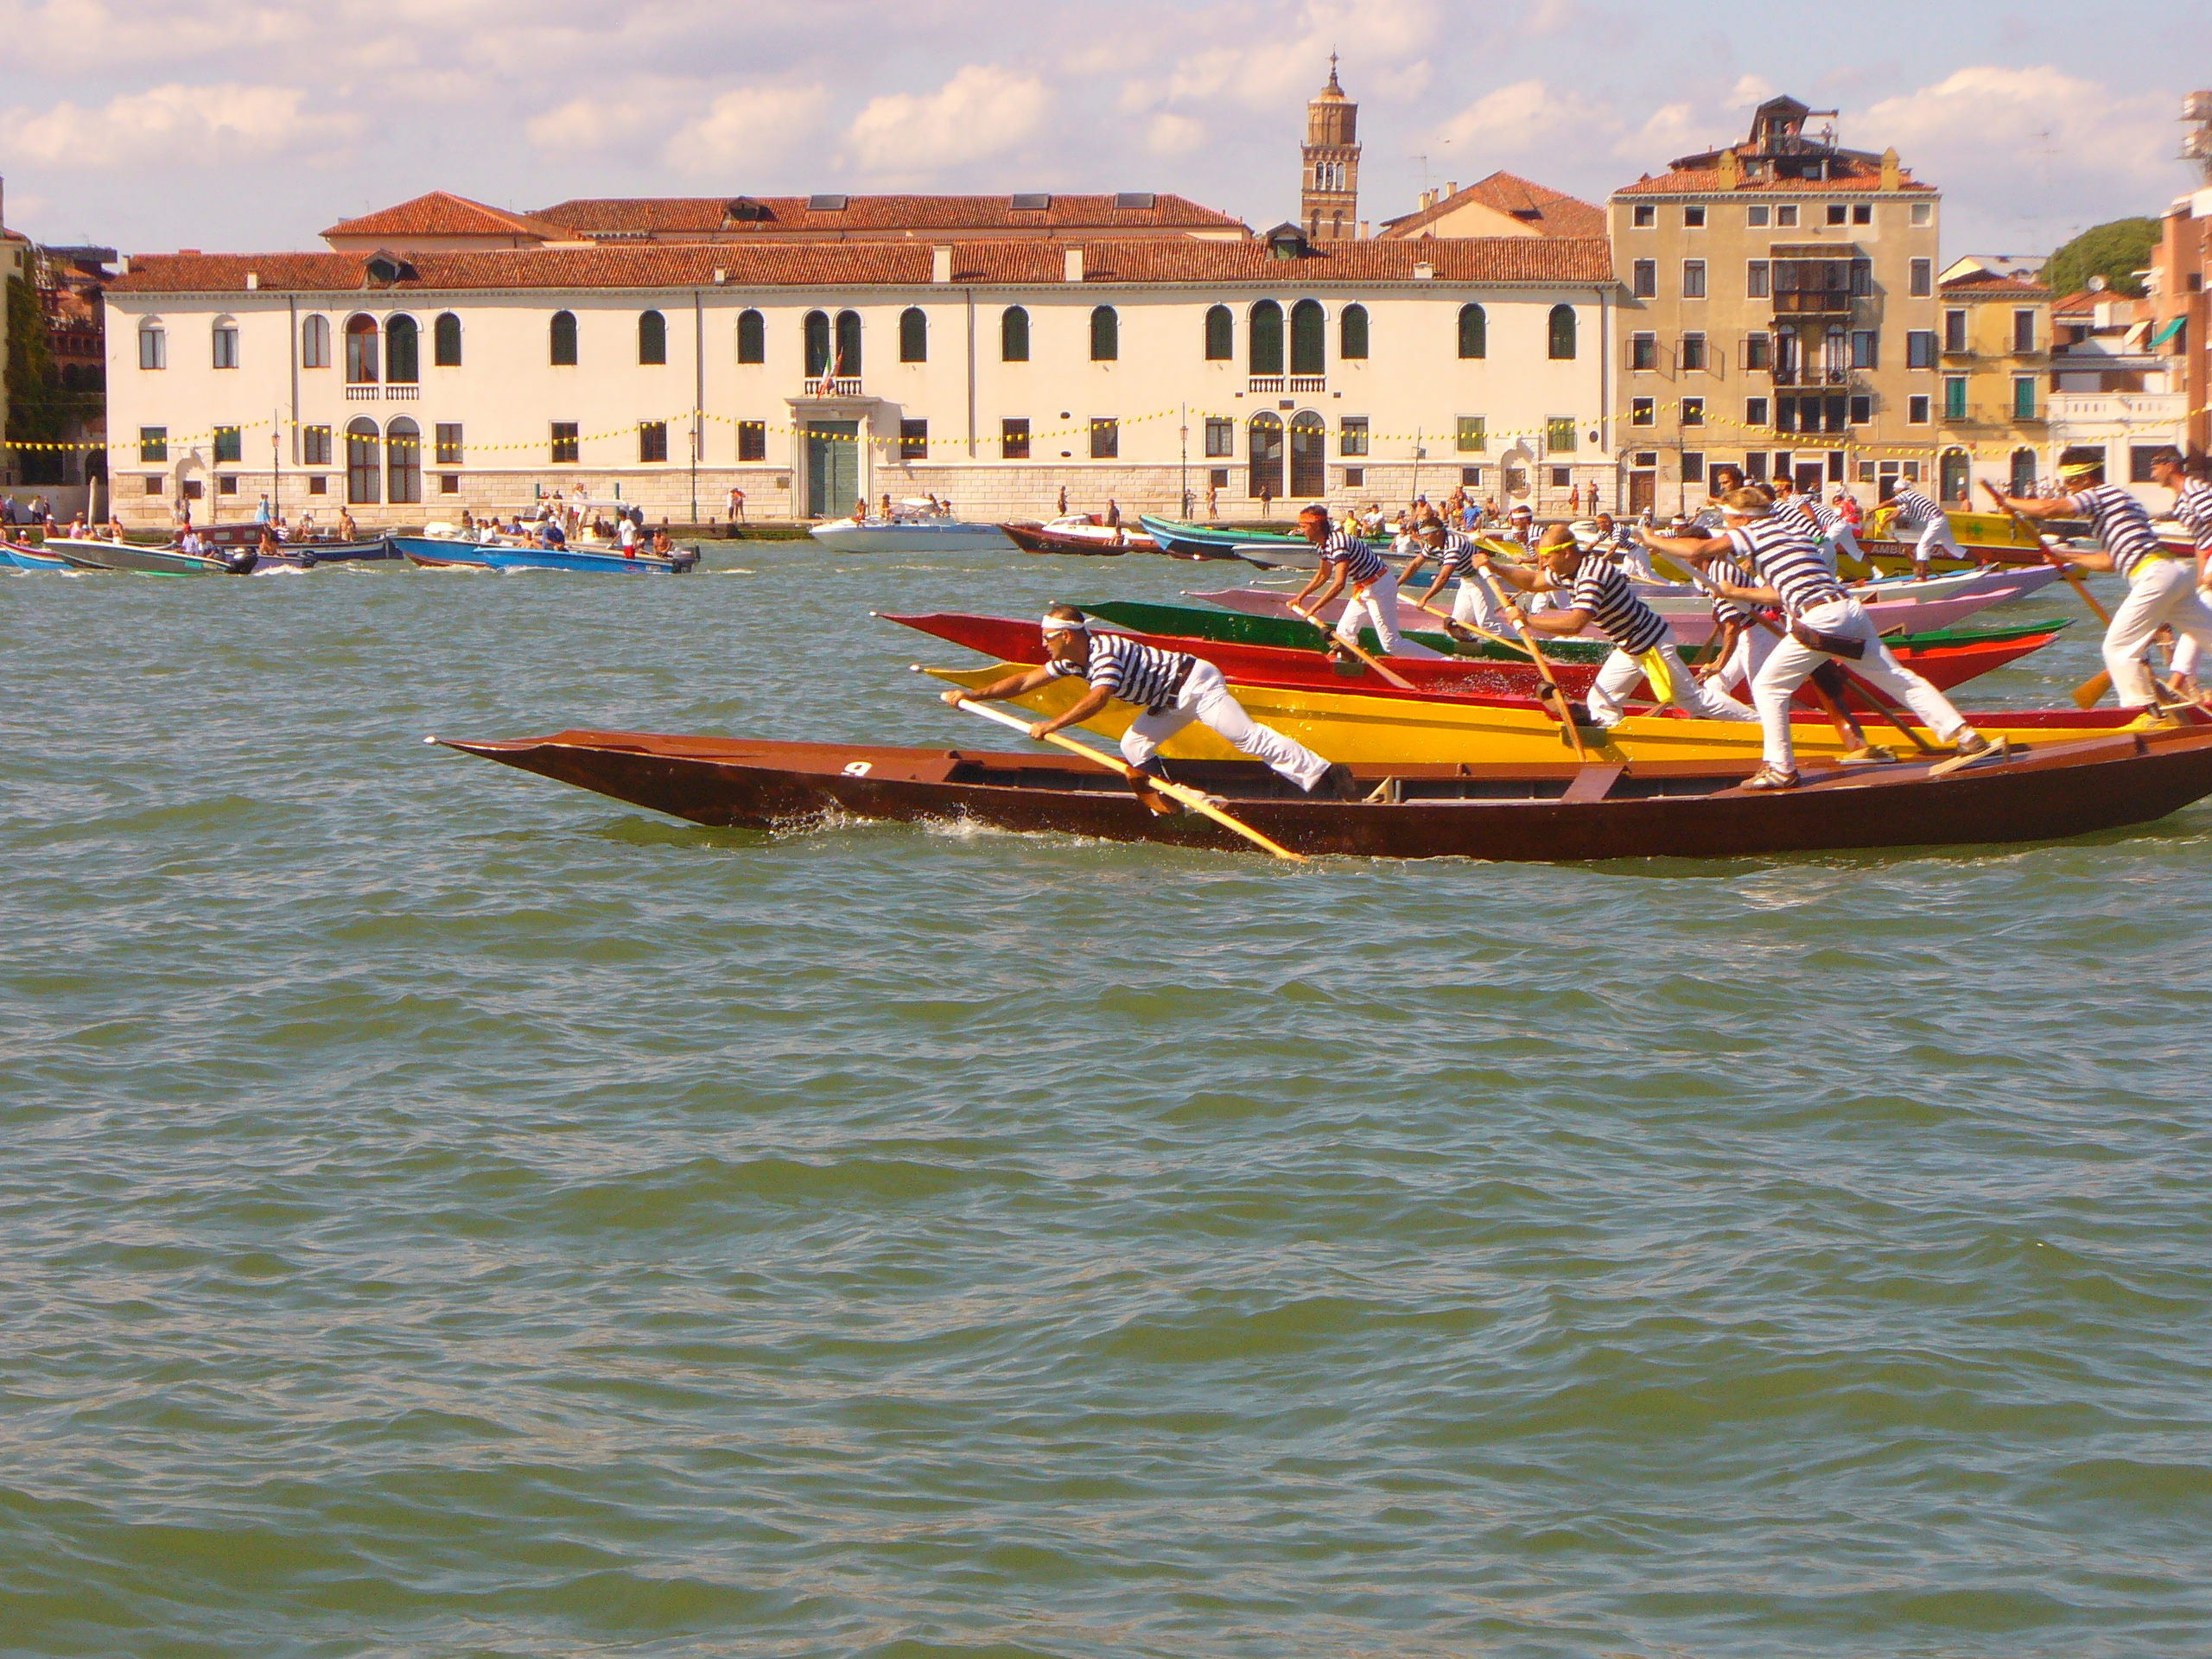 Regata a Venezia: Festa del Redentore